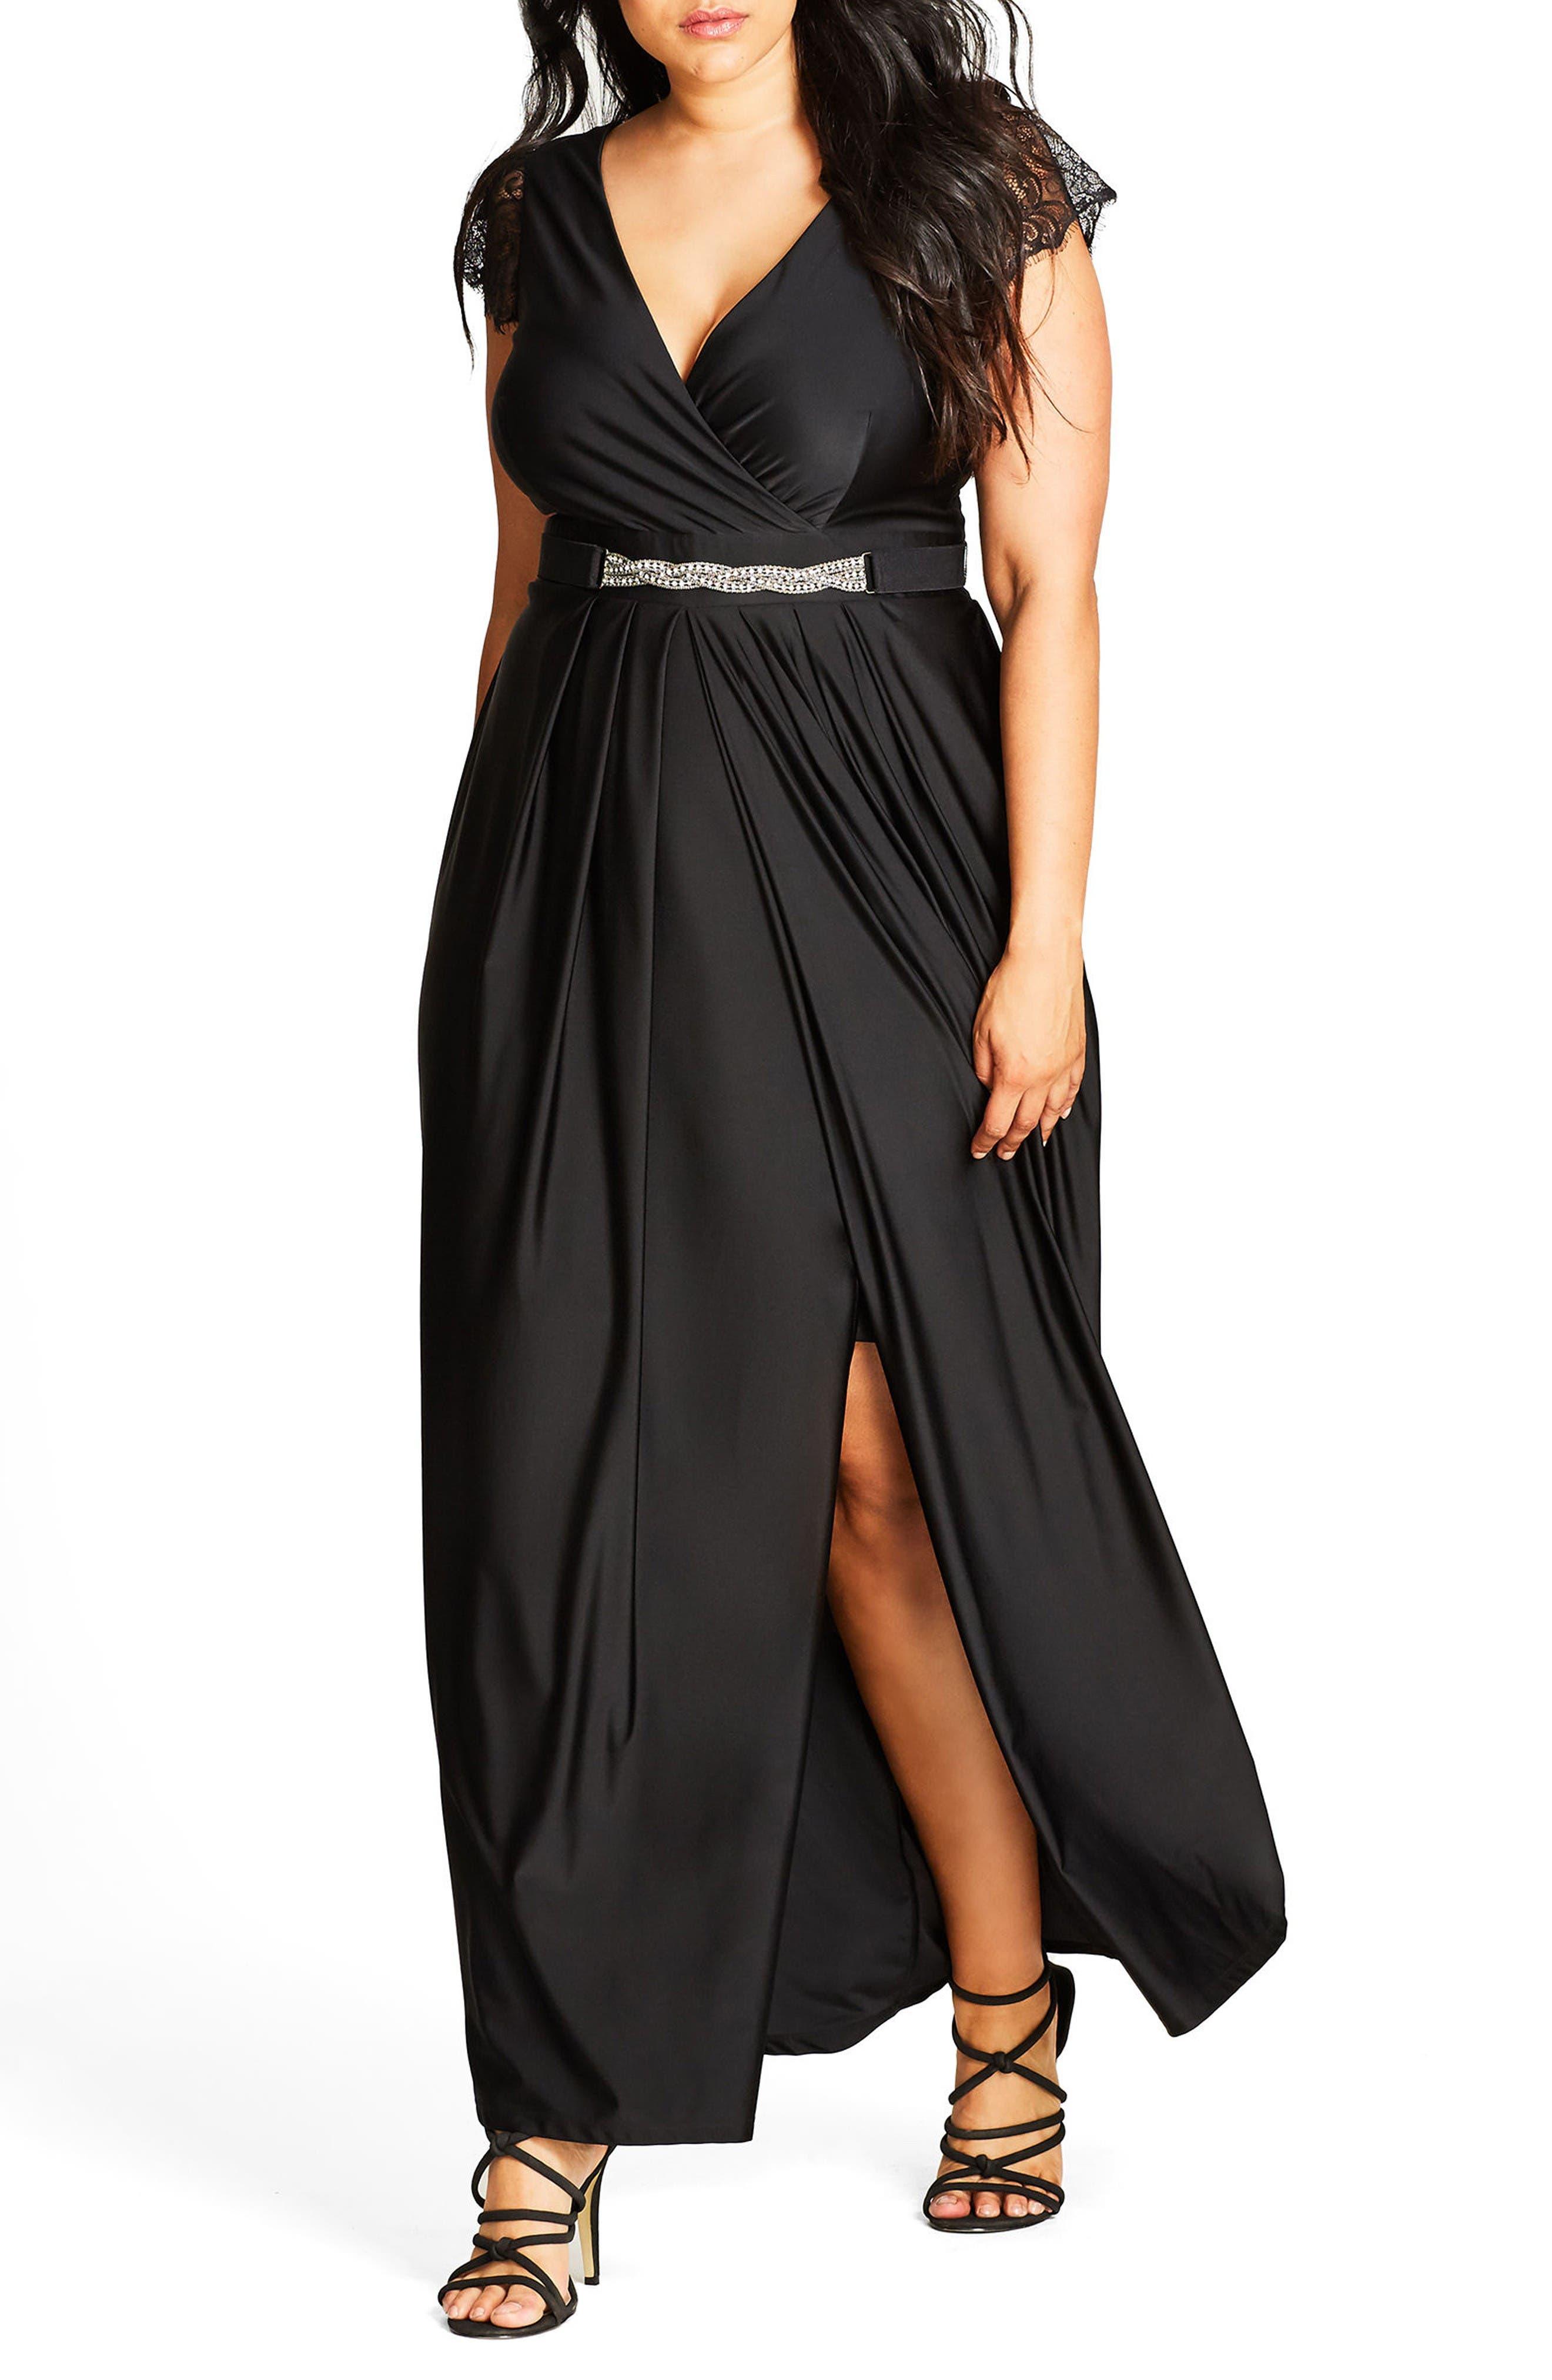 Alternate Image 1 Selected - City Chic Flirty Drape Maxi Dress (Plus Size)